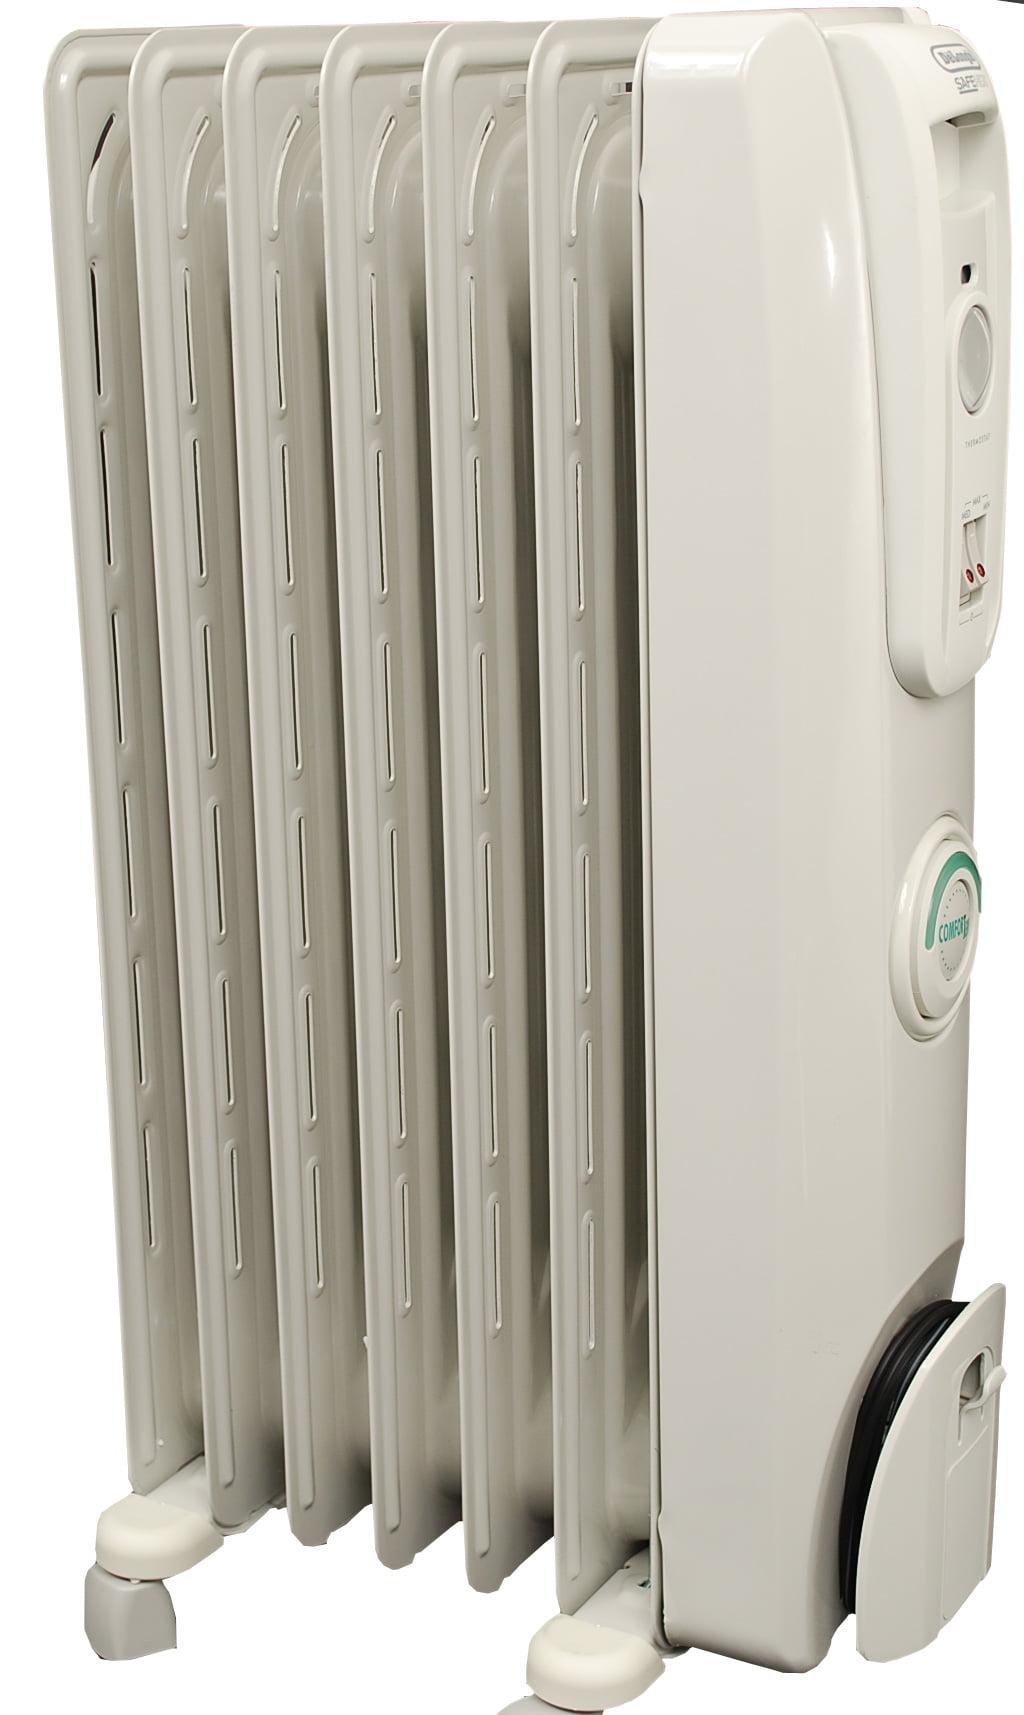 Delonghi safe heat oil filled radiator - Delonghi Safeheat 1500 Watt Comfortemp Portable Oil Filled Radiator Grey Walmart Com